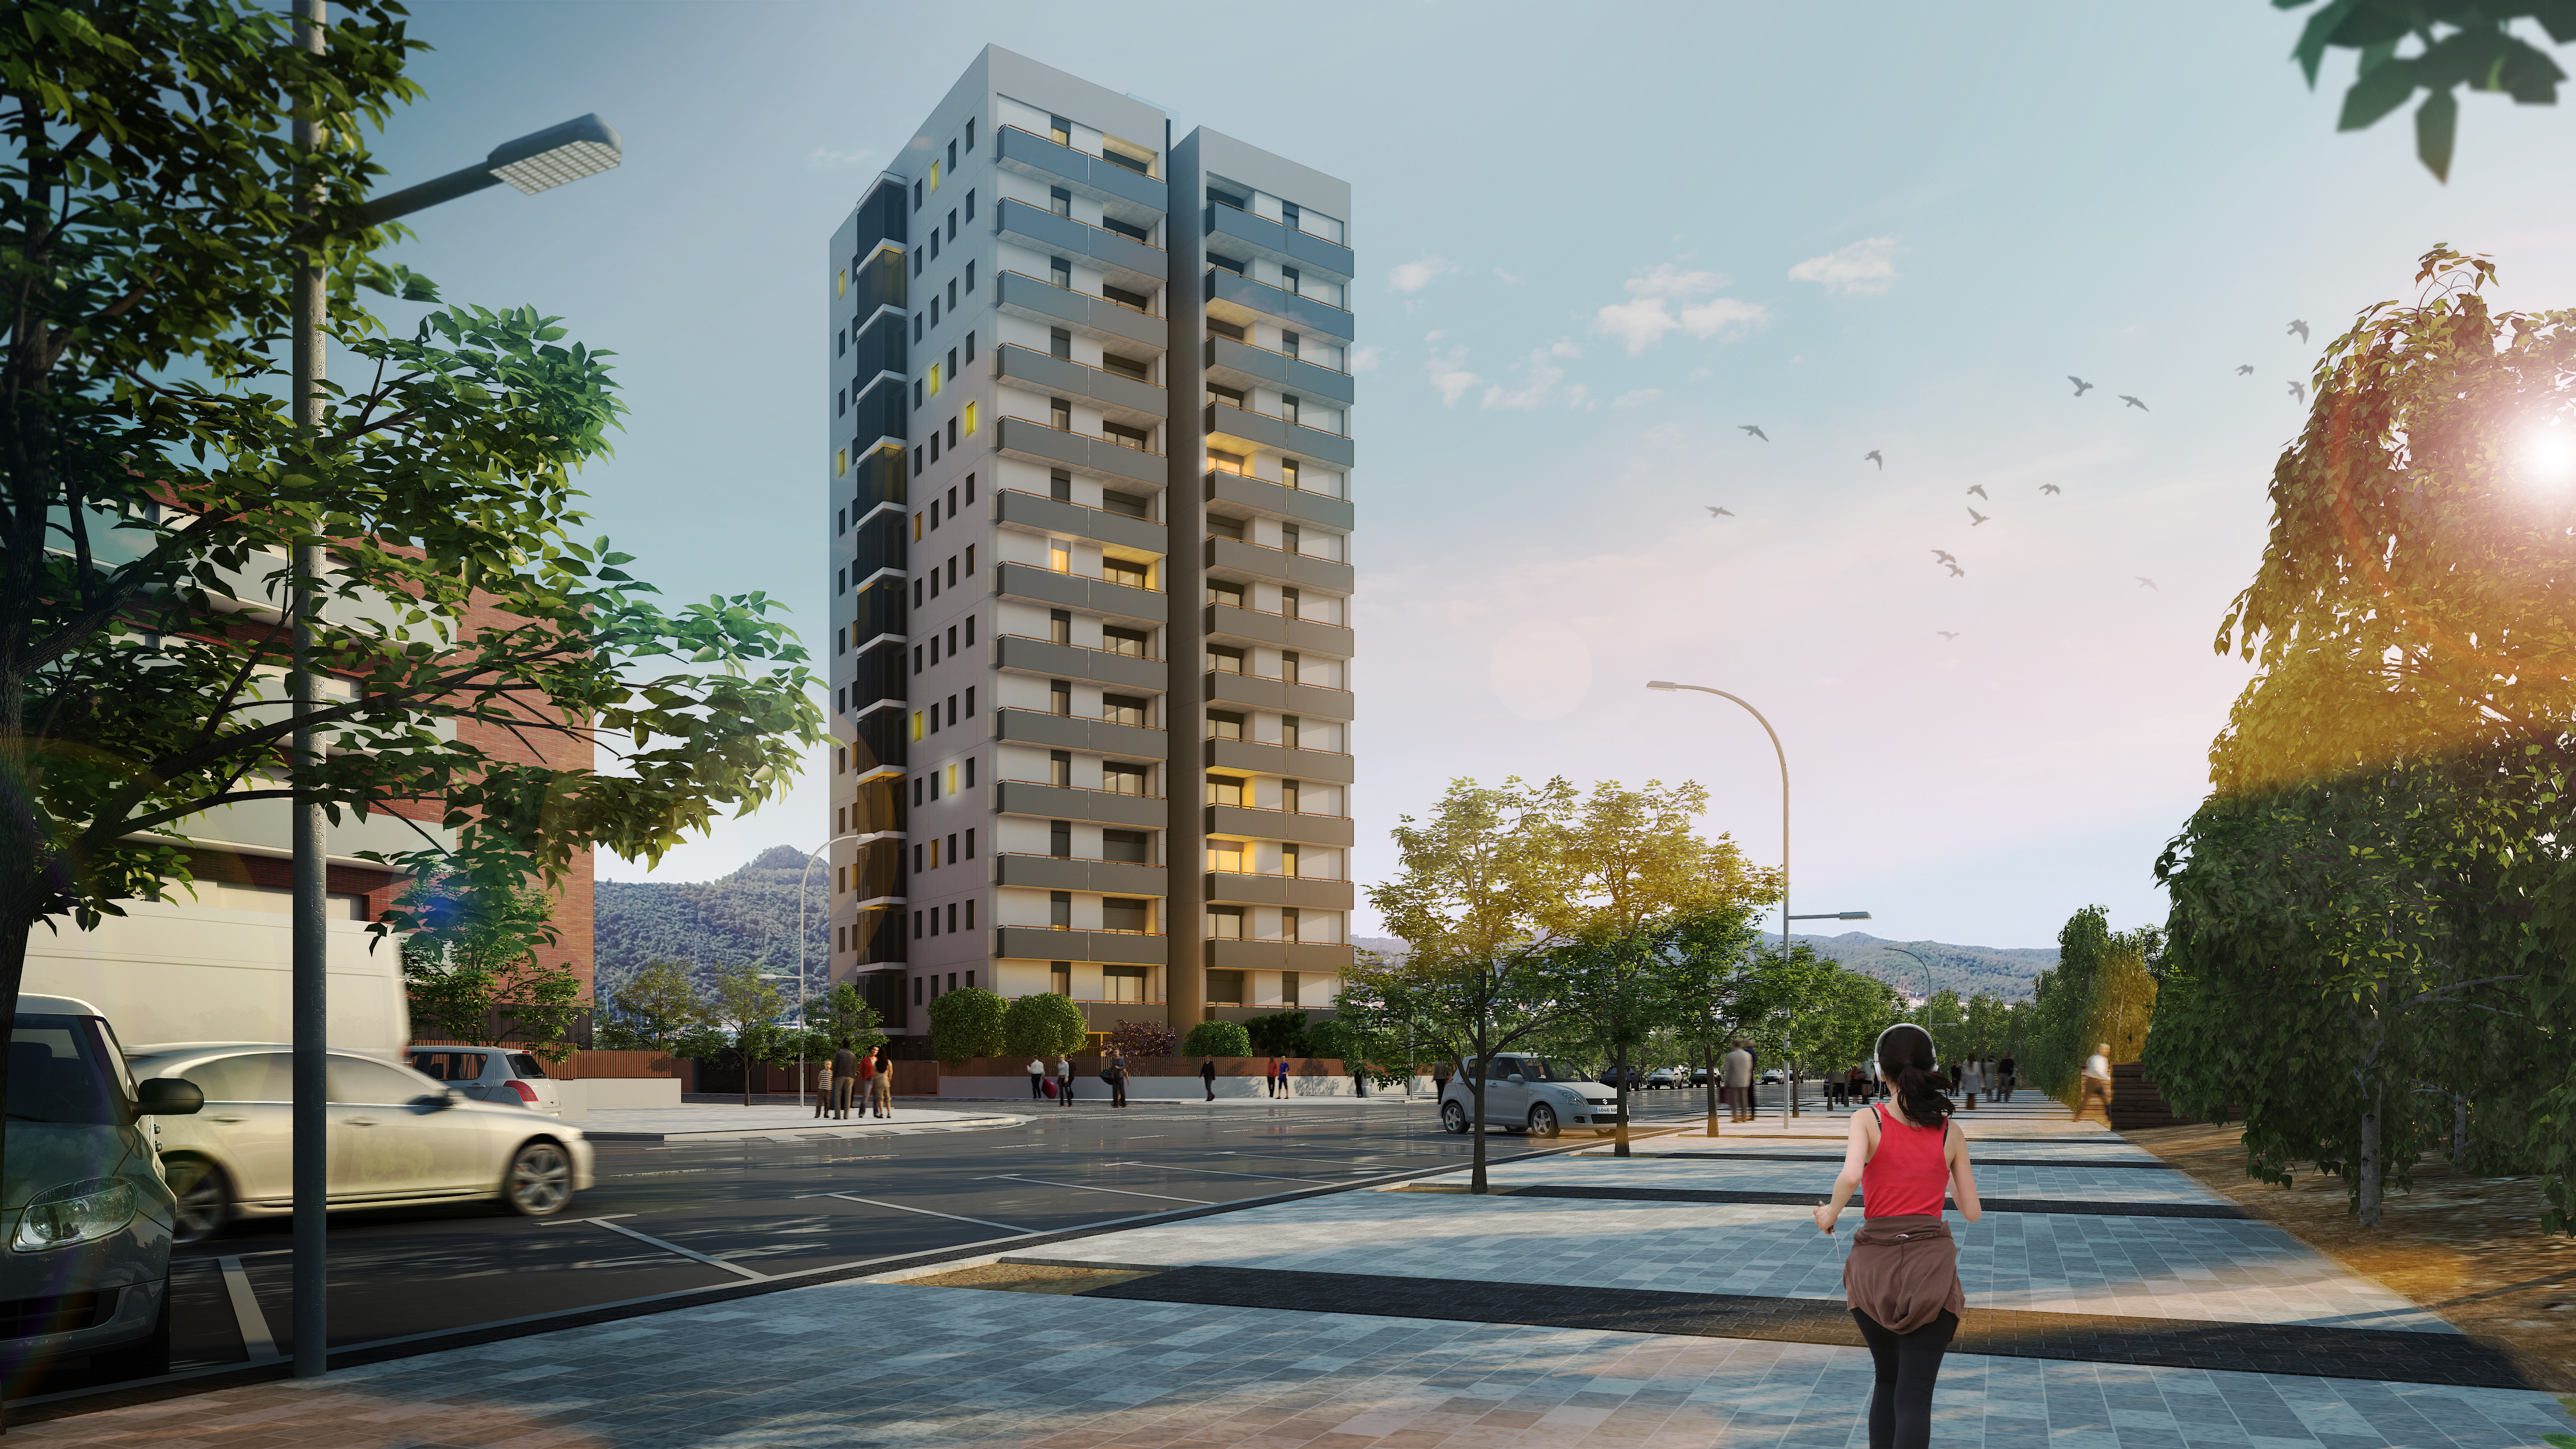 Obra Nueva en Venta en Montcada i Reixac (Barcelona)